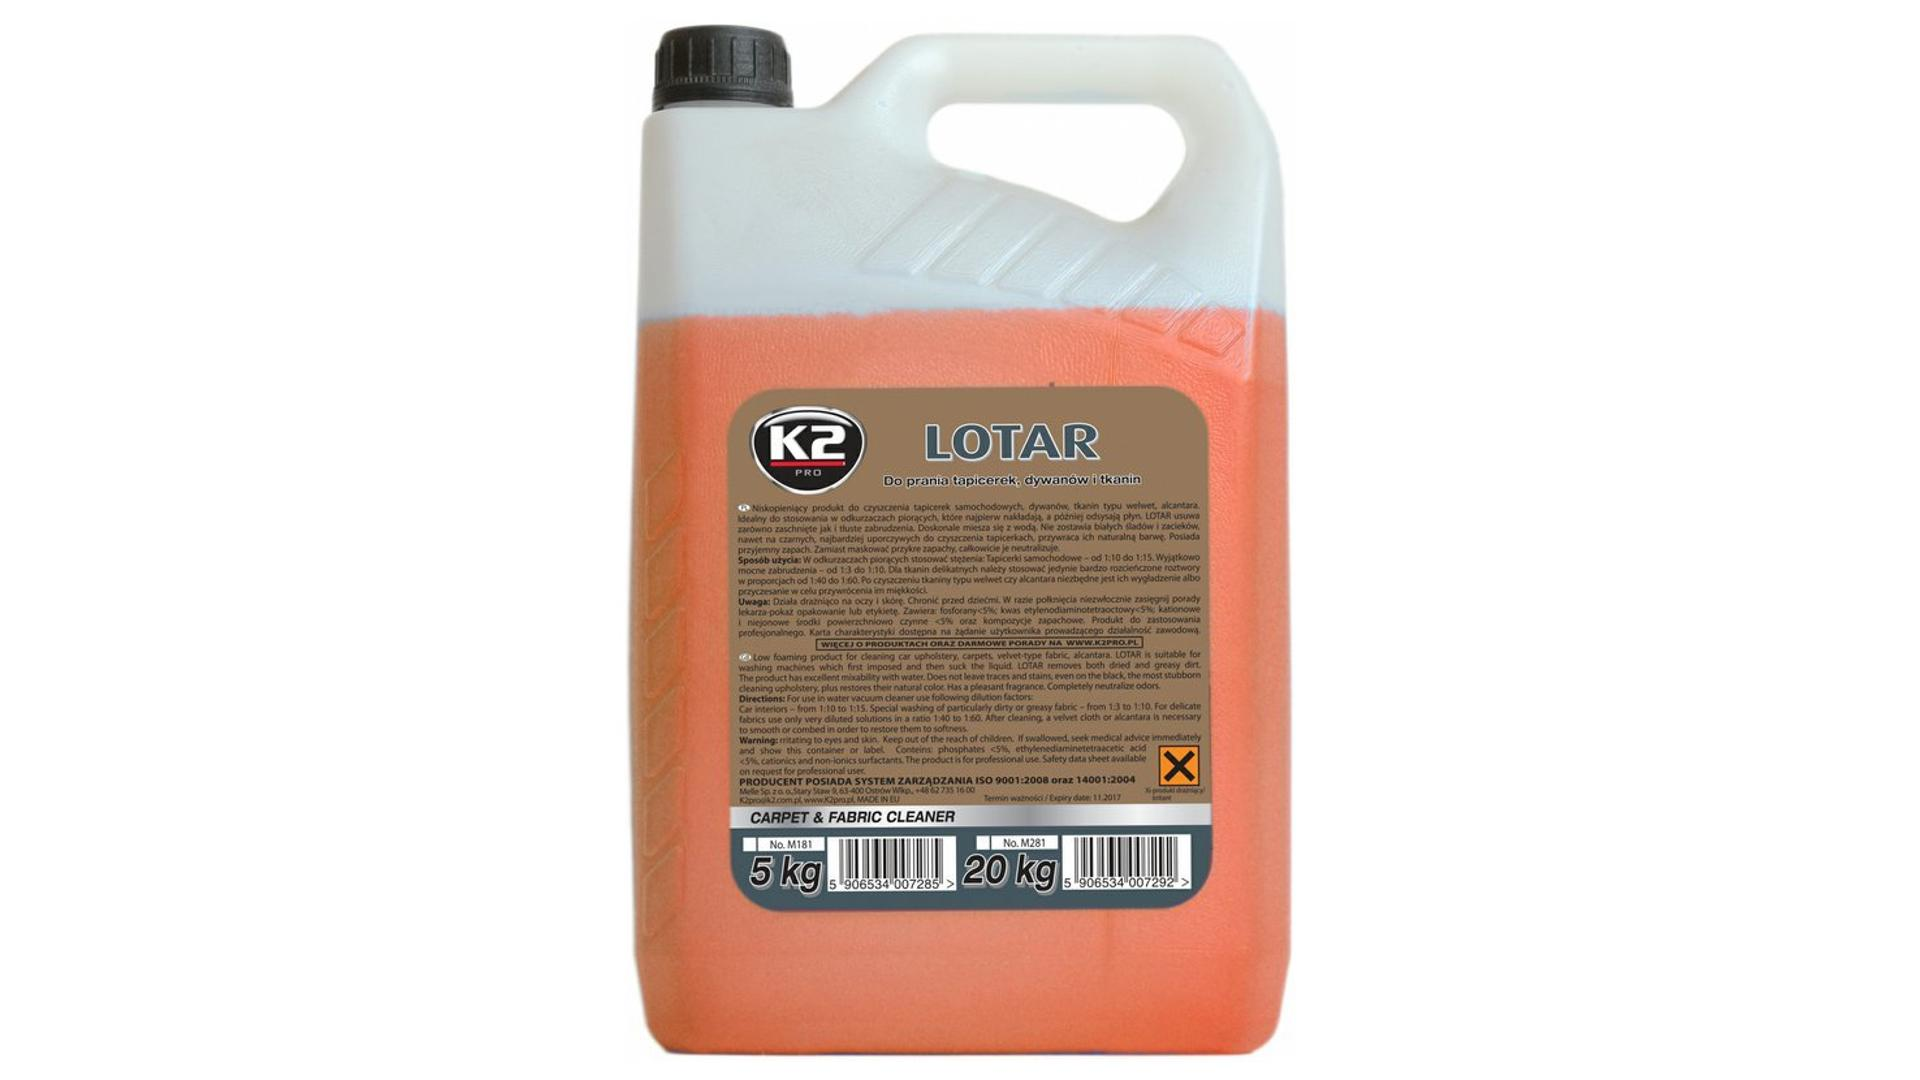 K2 LOTAR 5 kg - čístí koberce a tkaniny